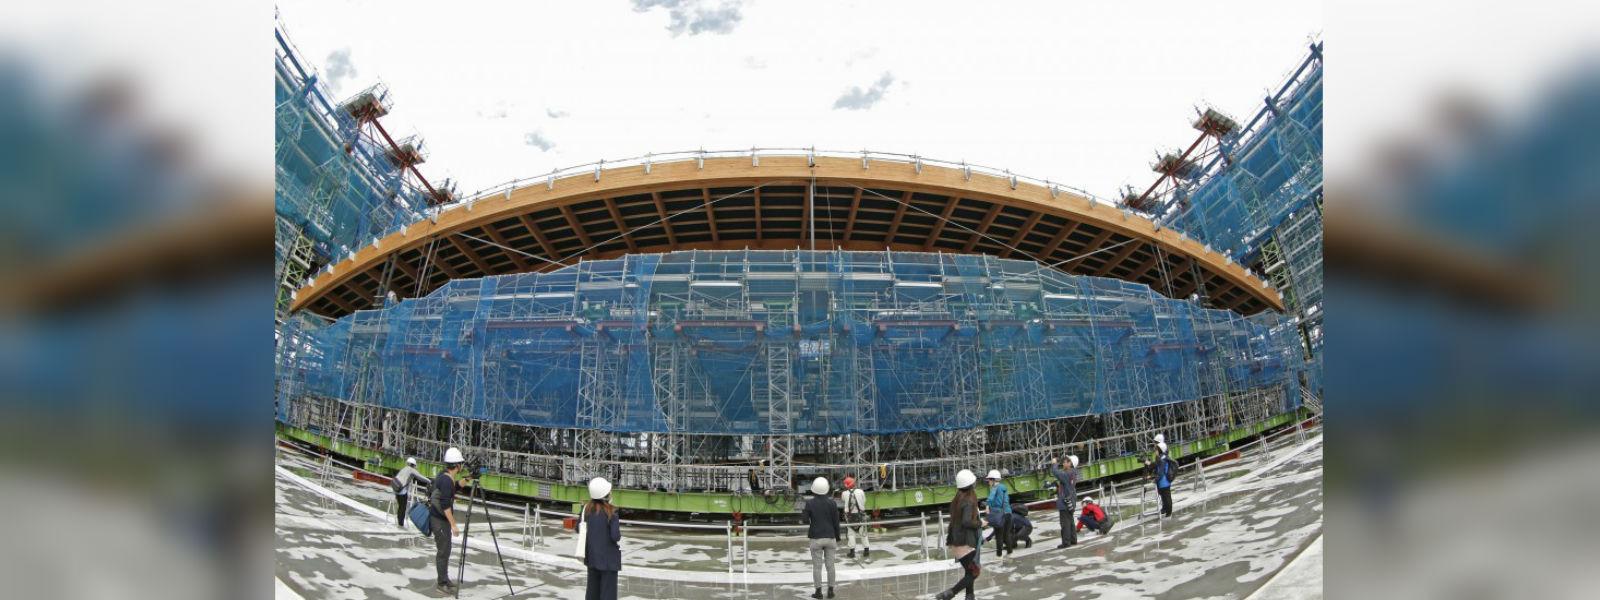 Tokyo 2020 gymnastics and boccia venue unveiled